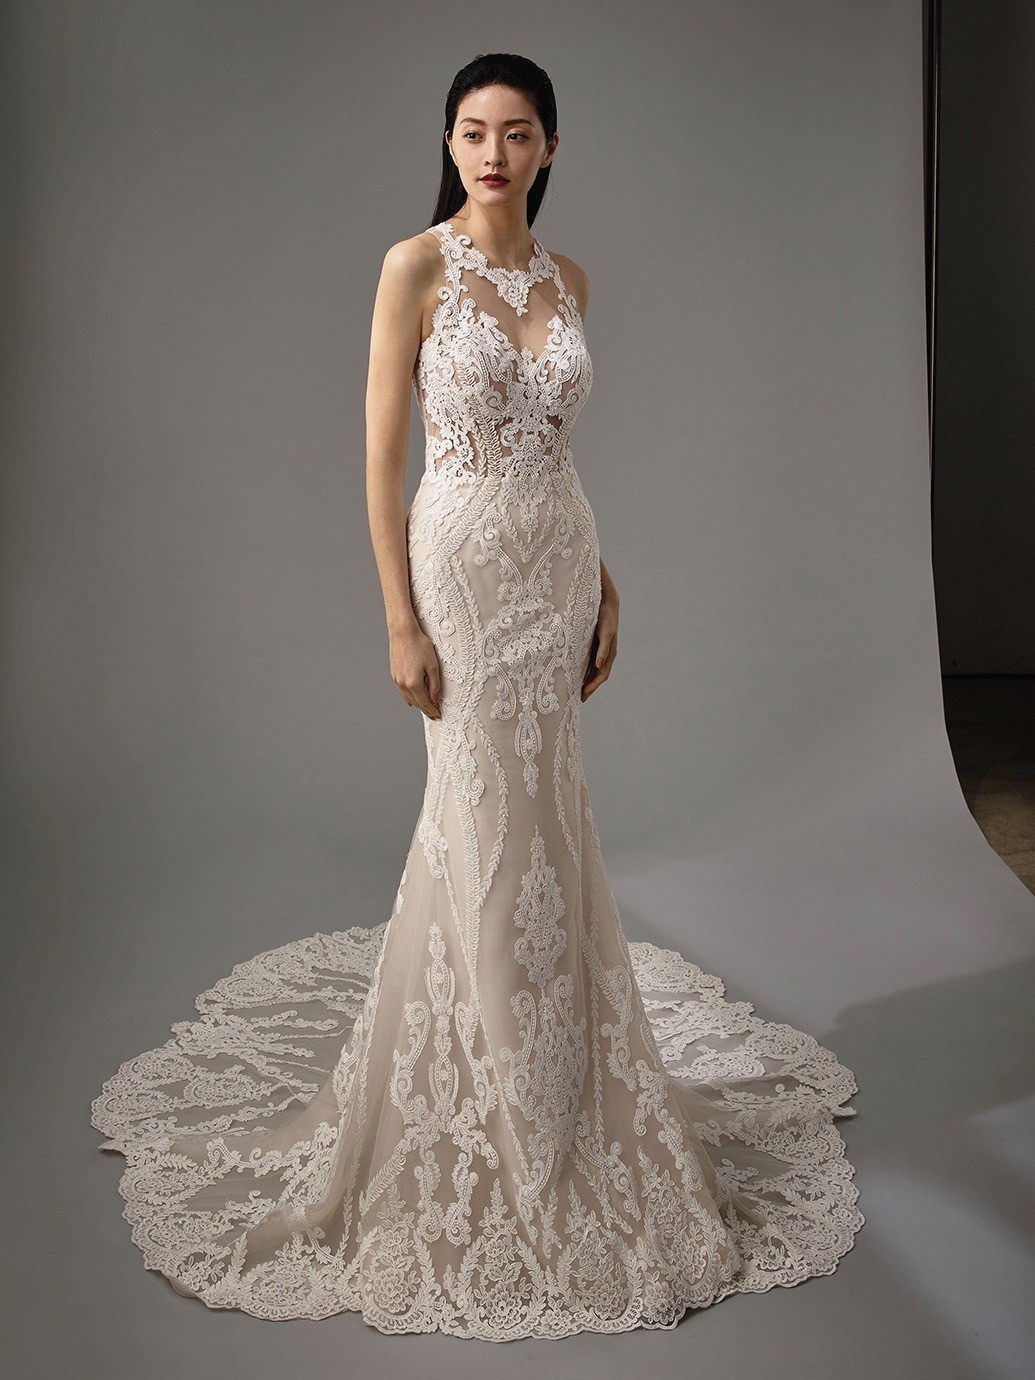 Brautkleid Modell Marci aus der Blue by Enzoani Kollektion 2020